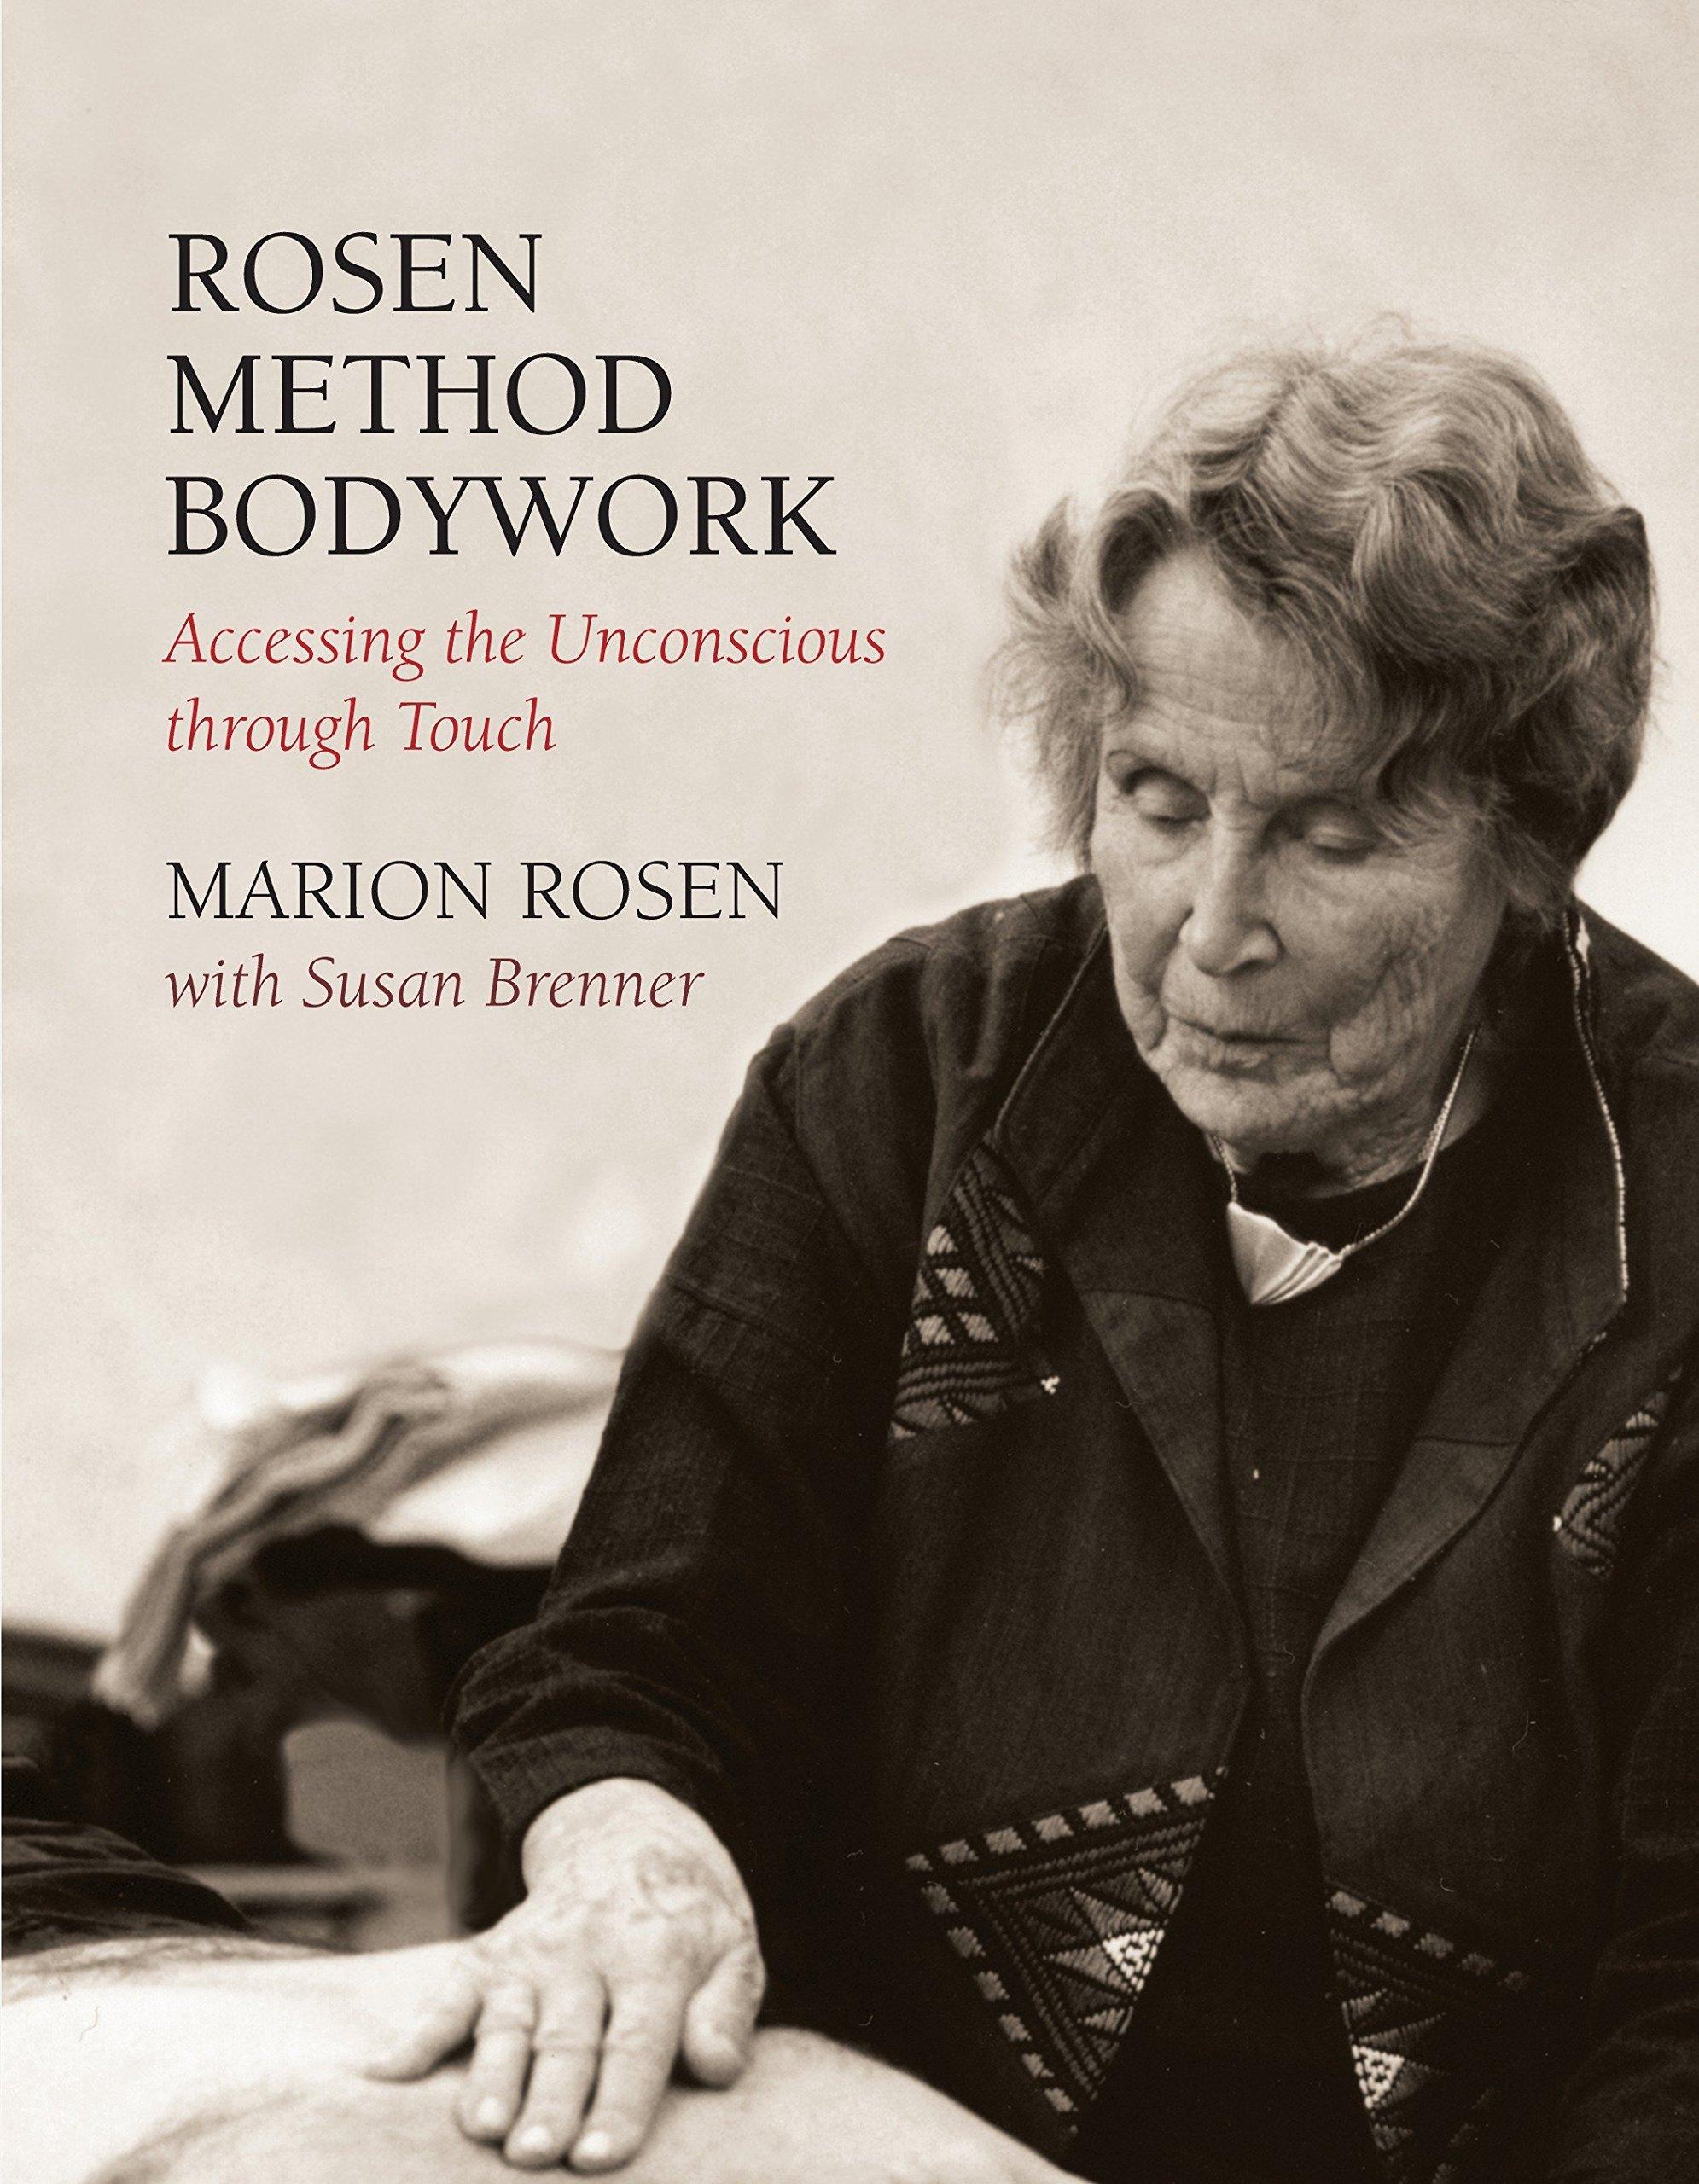 Download Rosen Method Bodywork: Accessing the Unconscious through Touch pdf